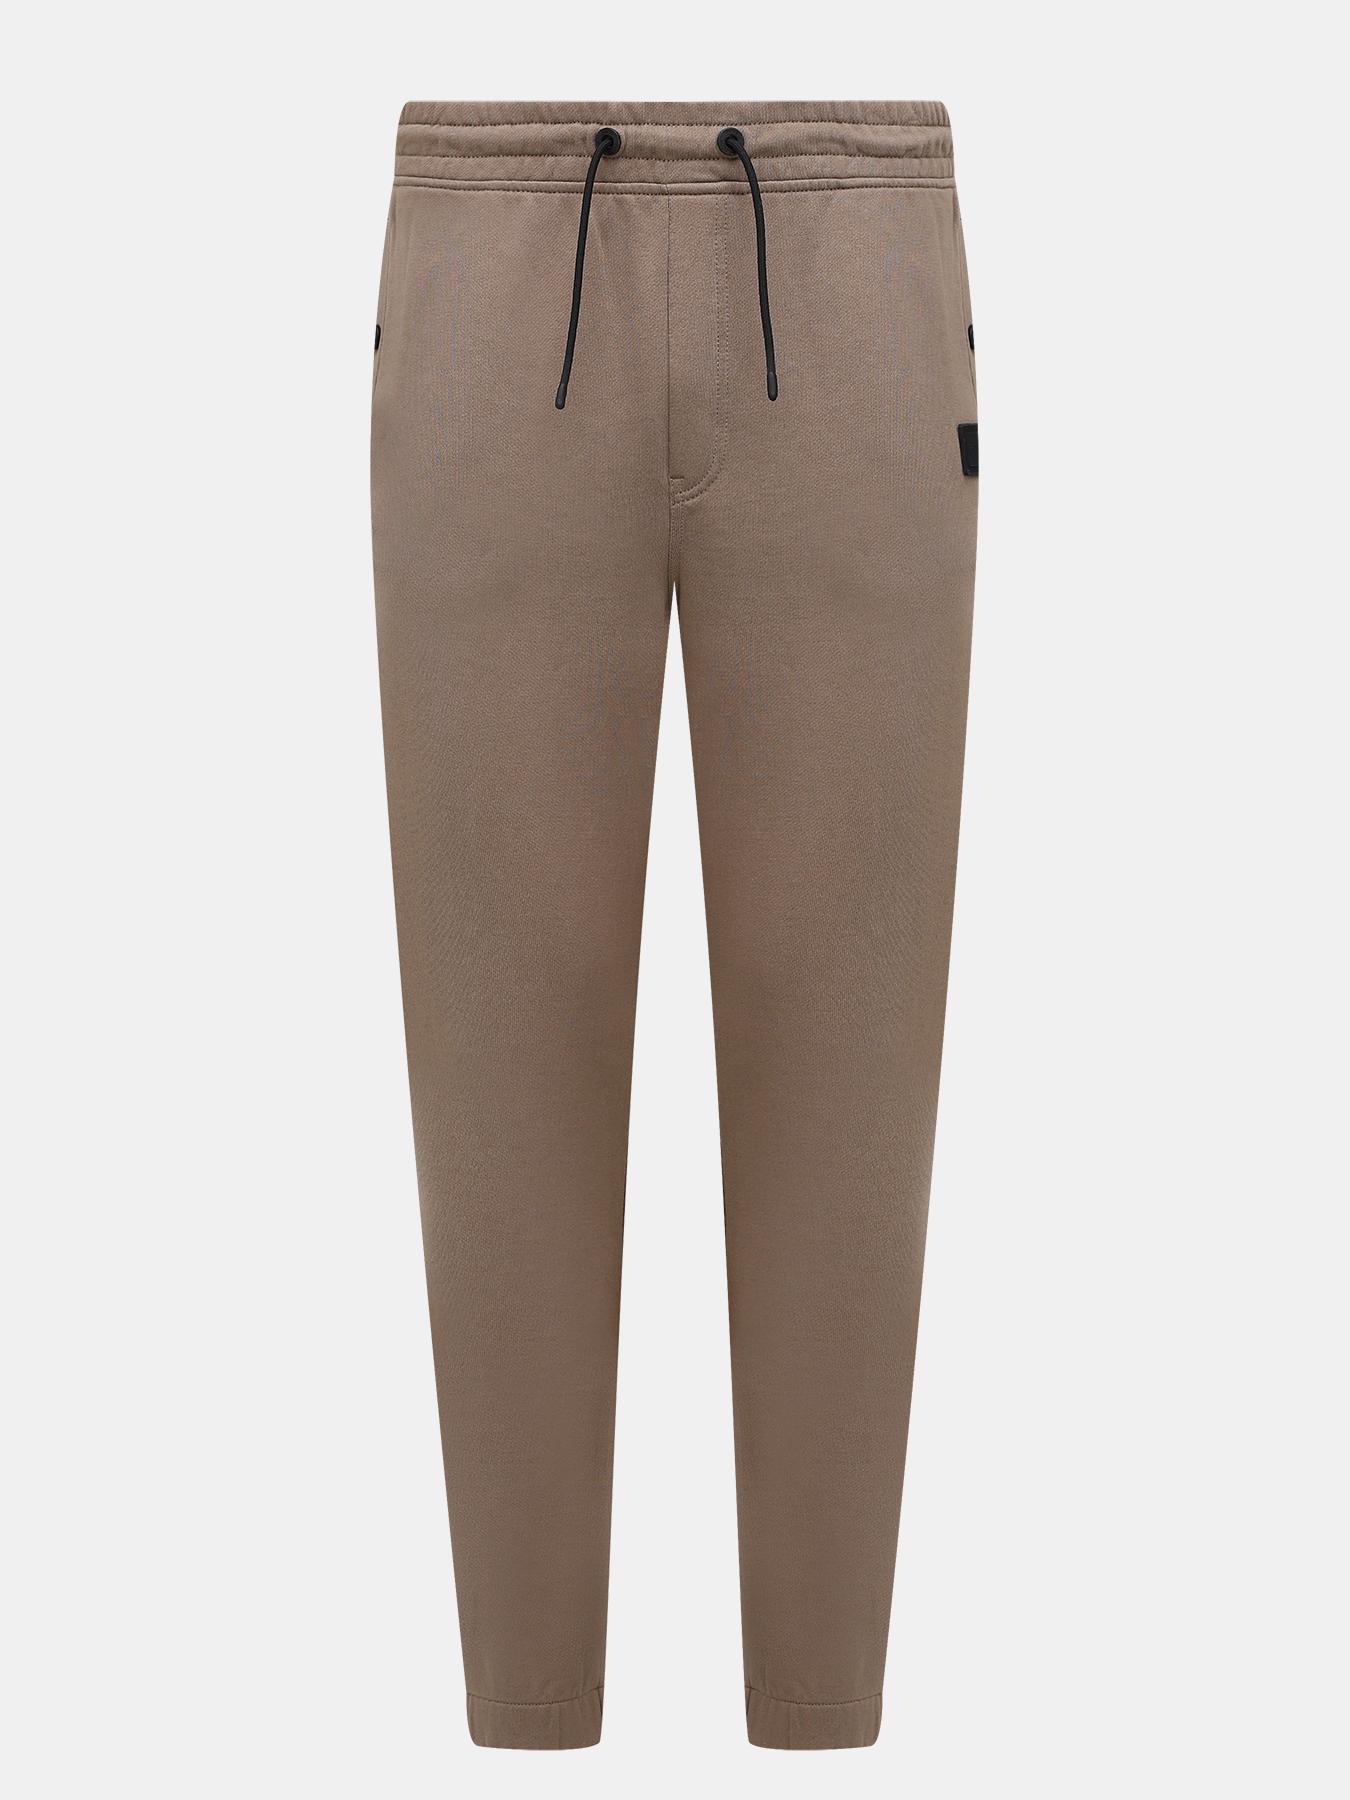 Спортивные брюки BOSS Брюки Skyman брюки boss брюки на резинке banks